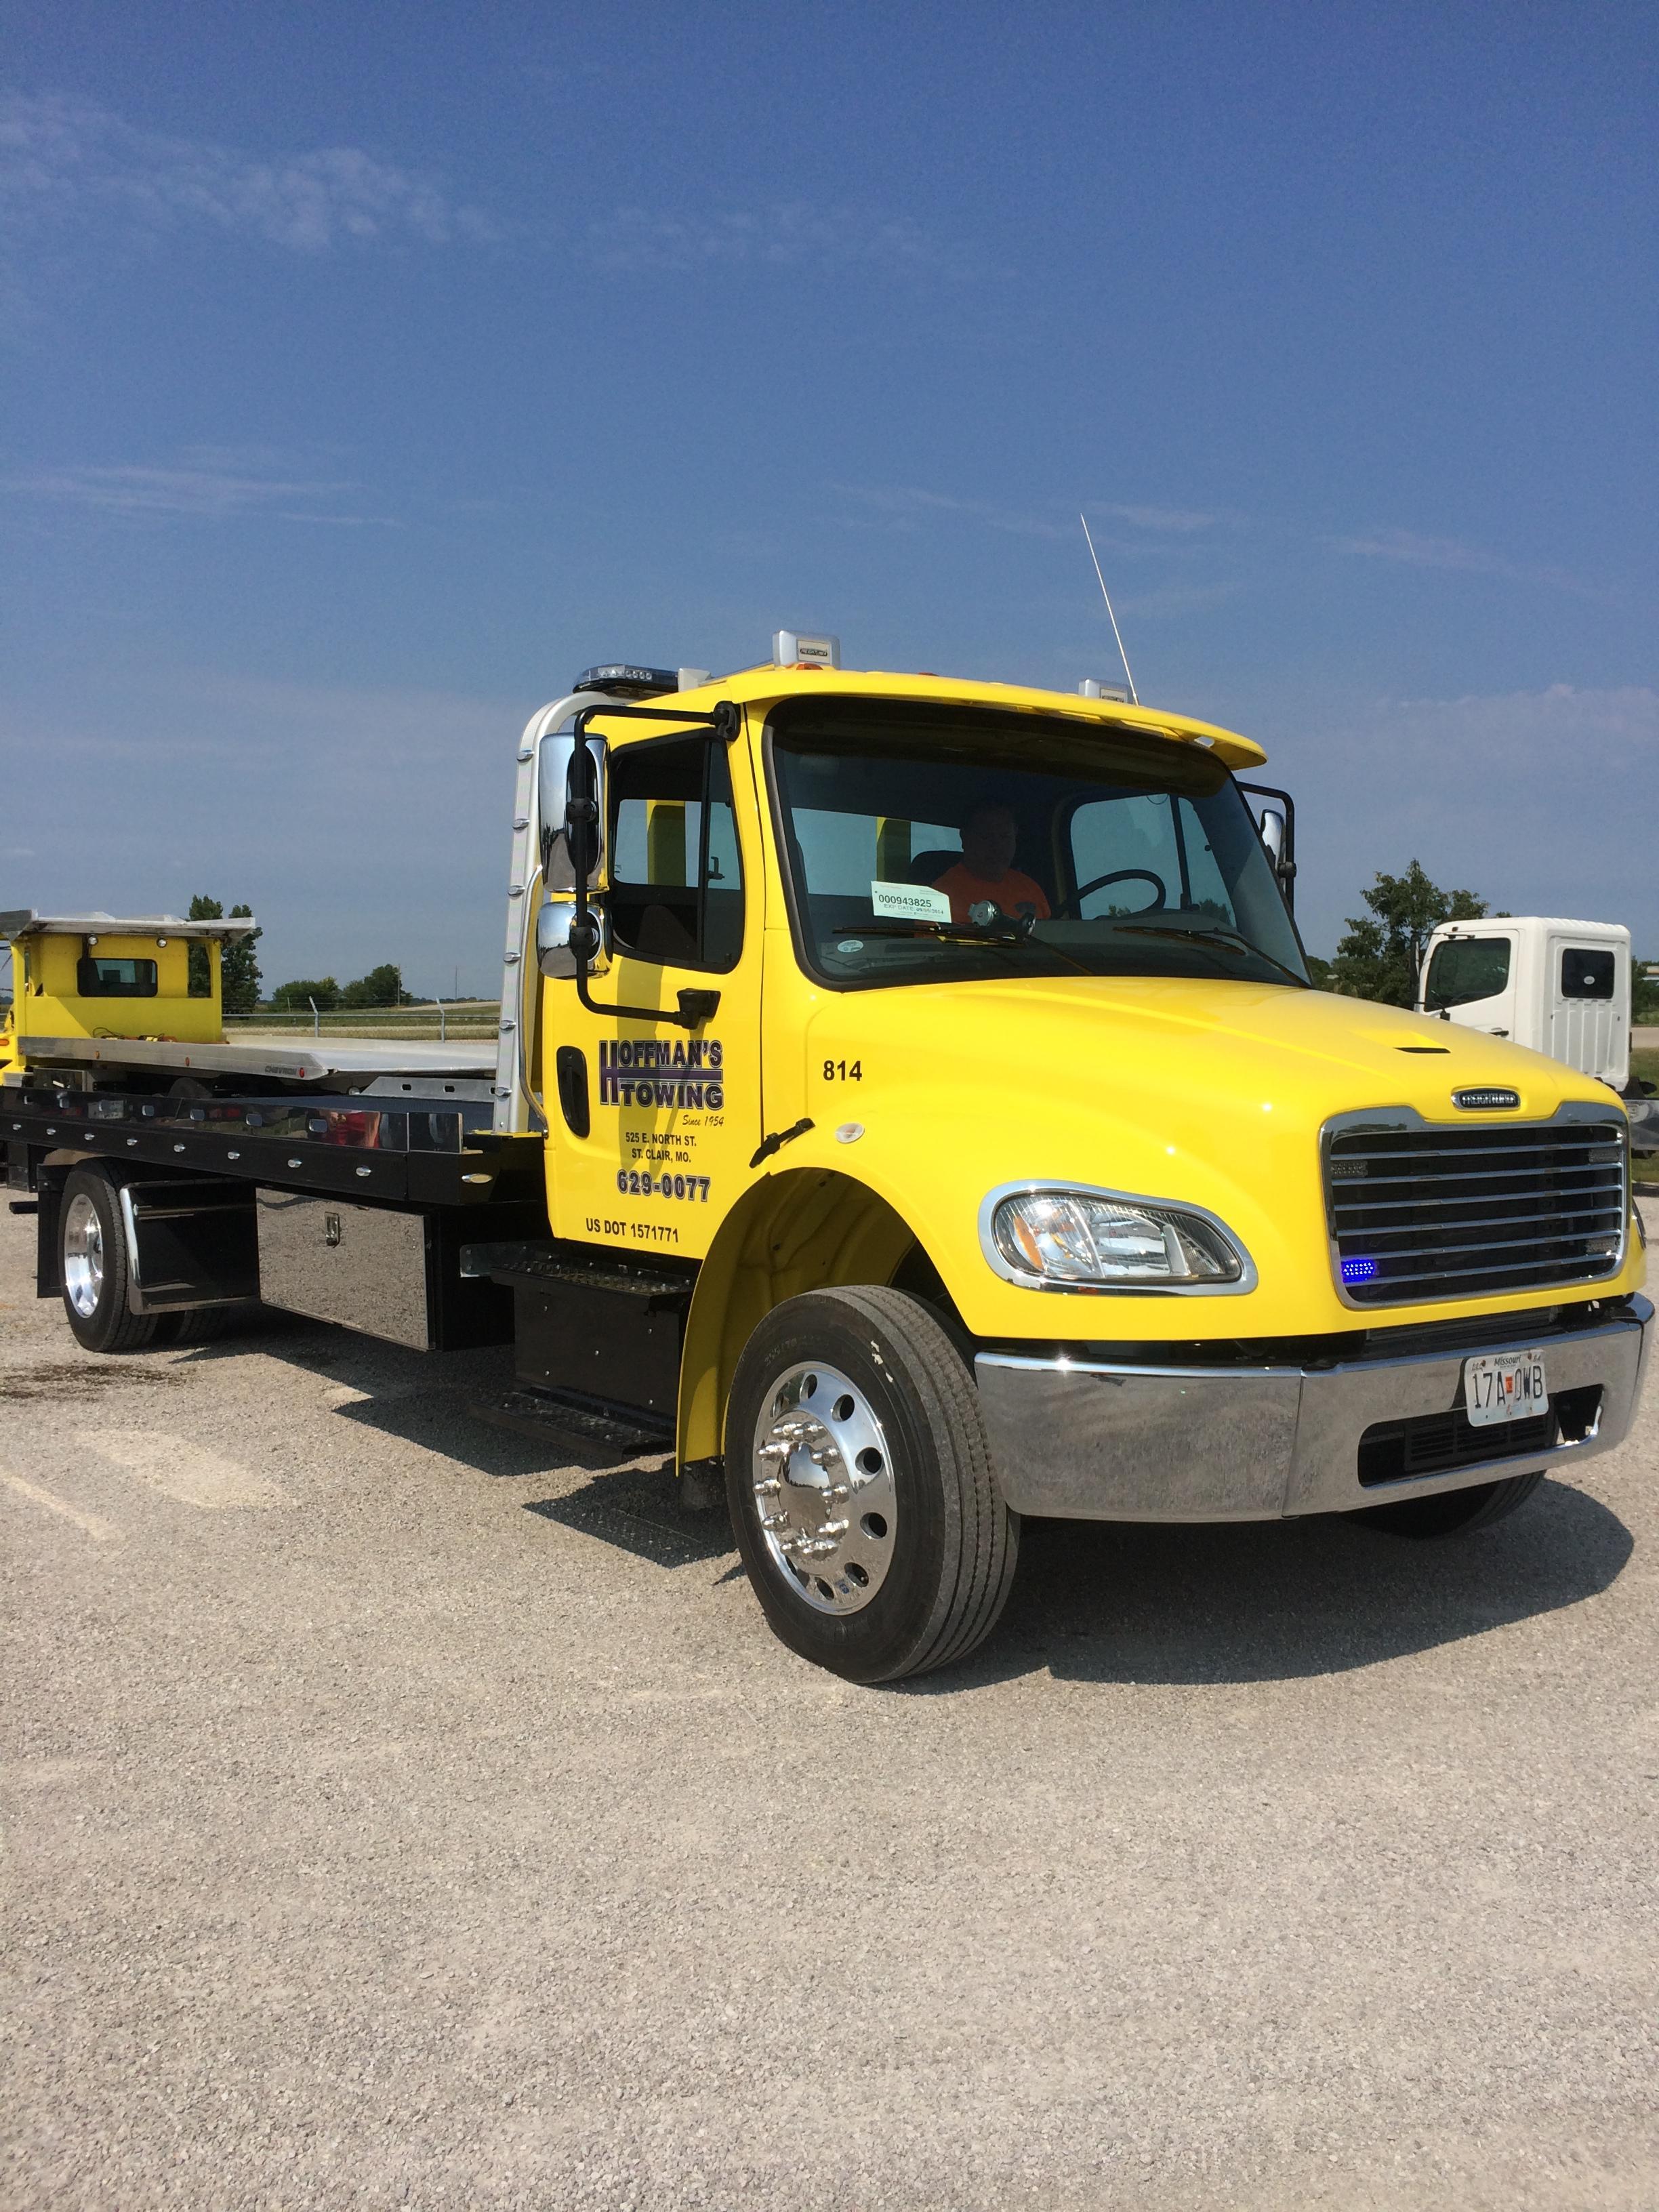 Hoffman's Towing & Service Inc image 5